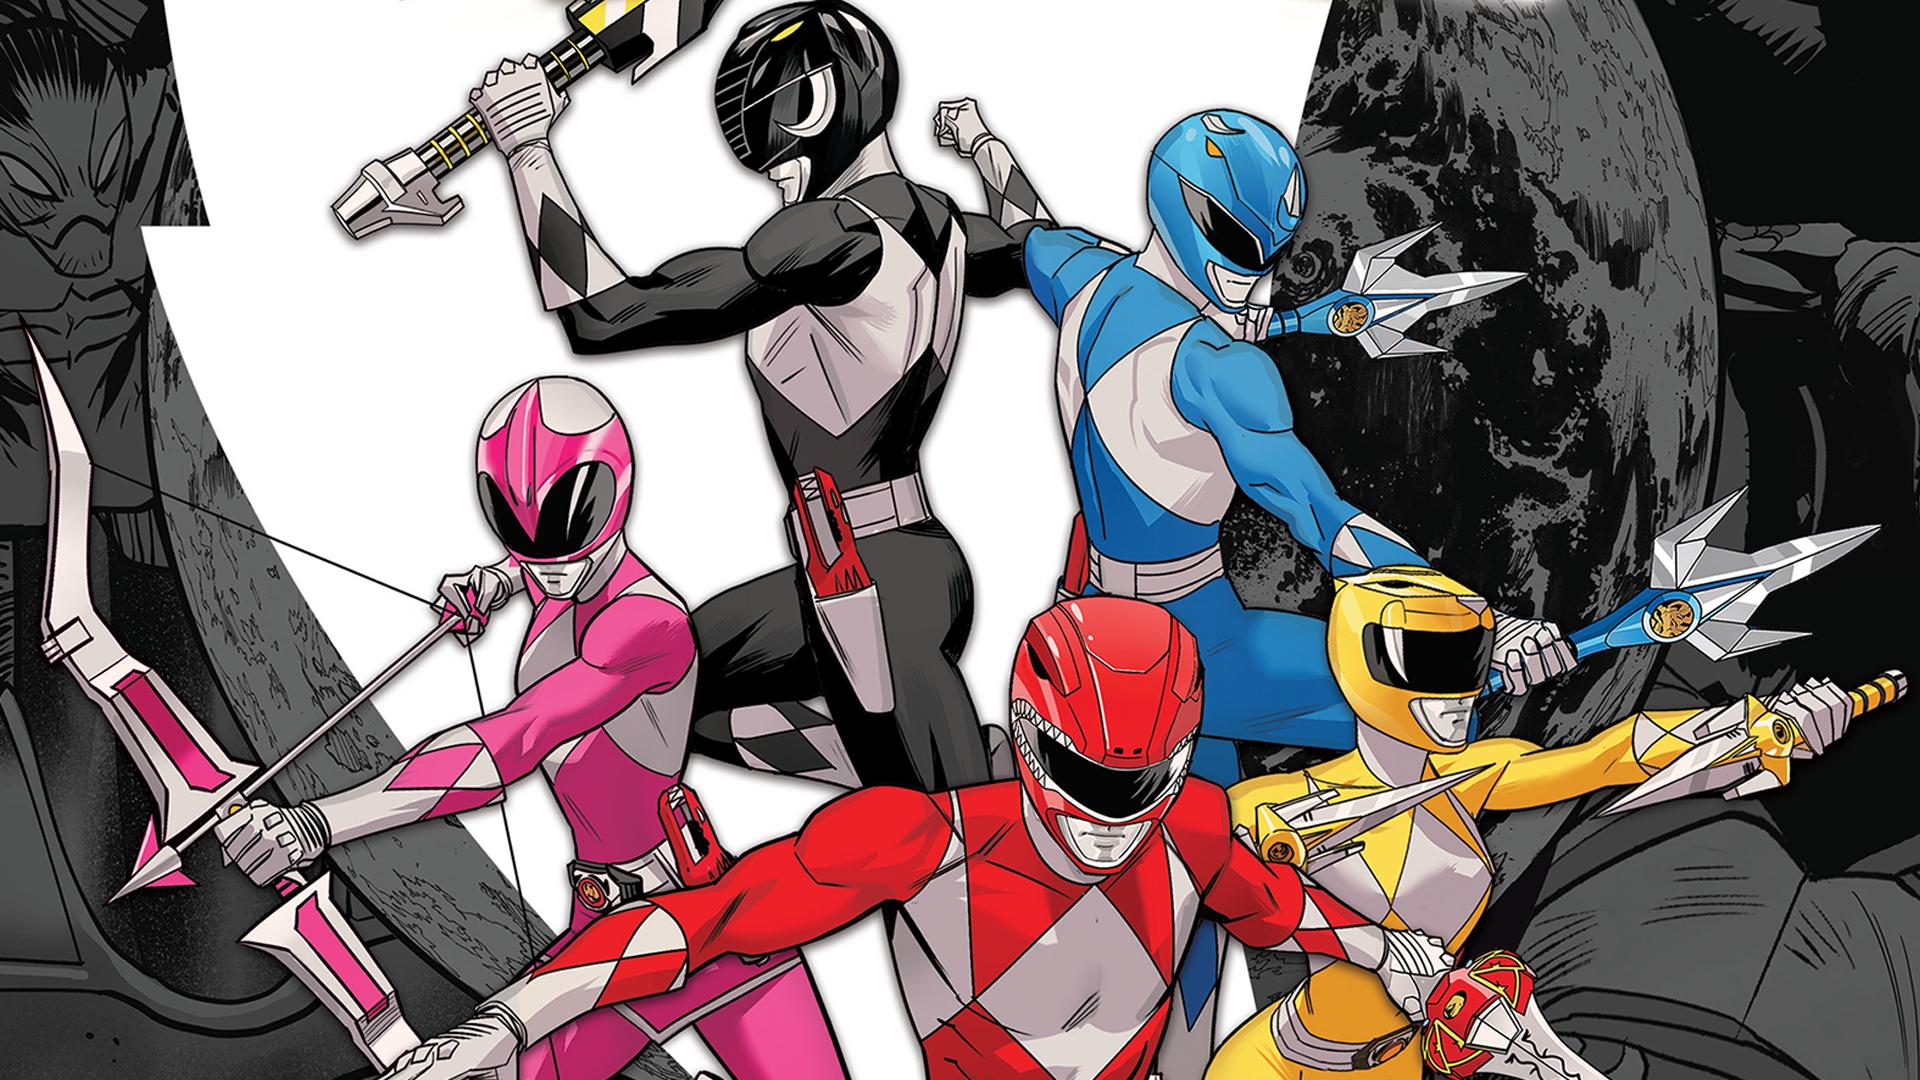 power-rangers-heroes-of-the-grid-board-game-art.png